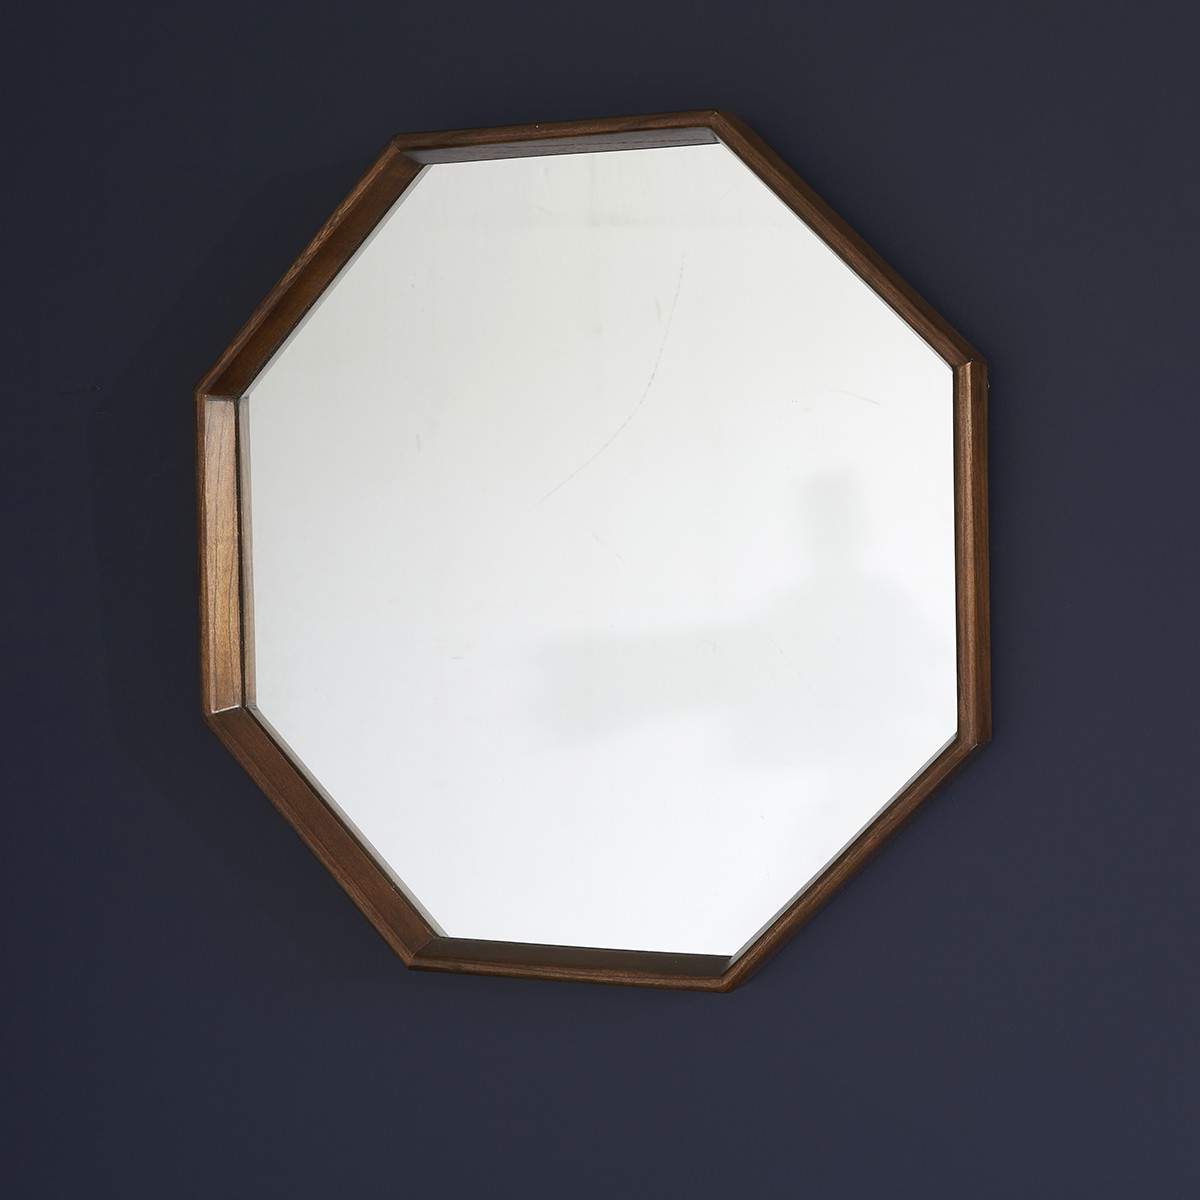 Miroir octogonal en bois de mindy D60